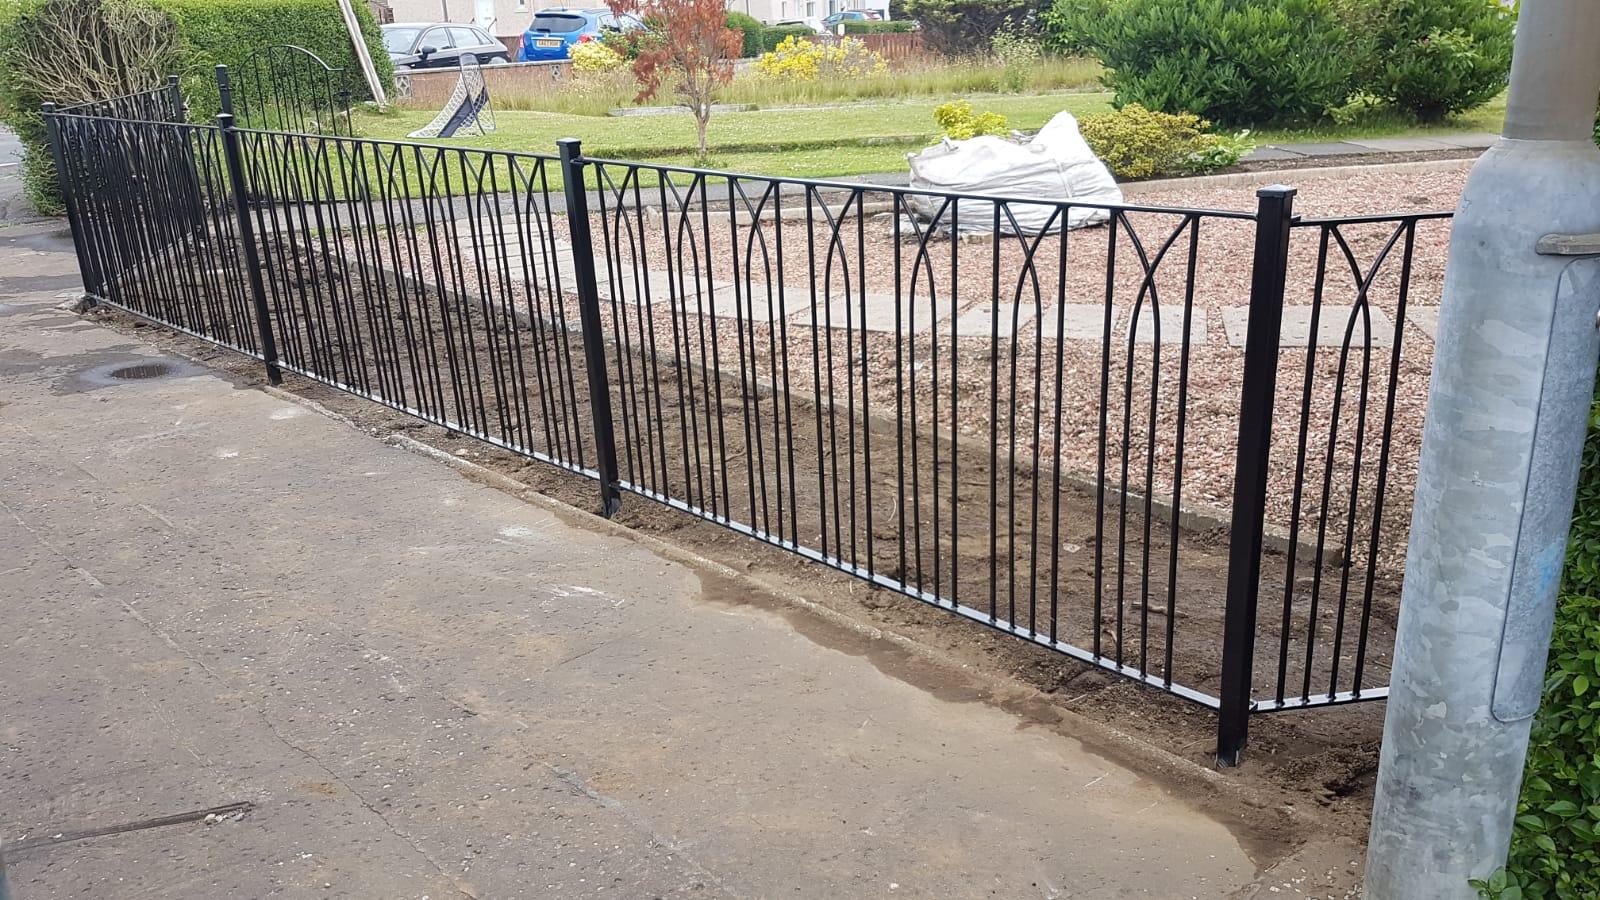 custom metal fencing by Dain Art Iron, Ayrshire Scotland.